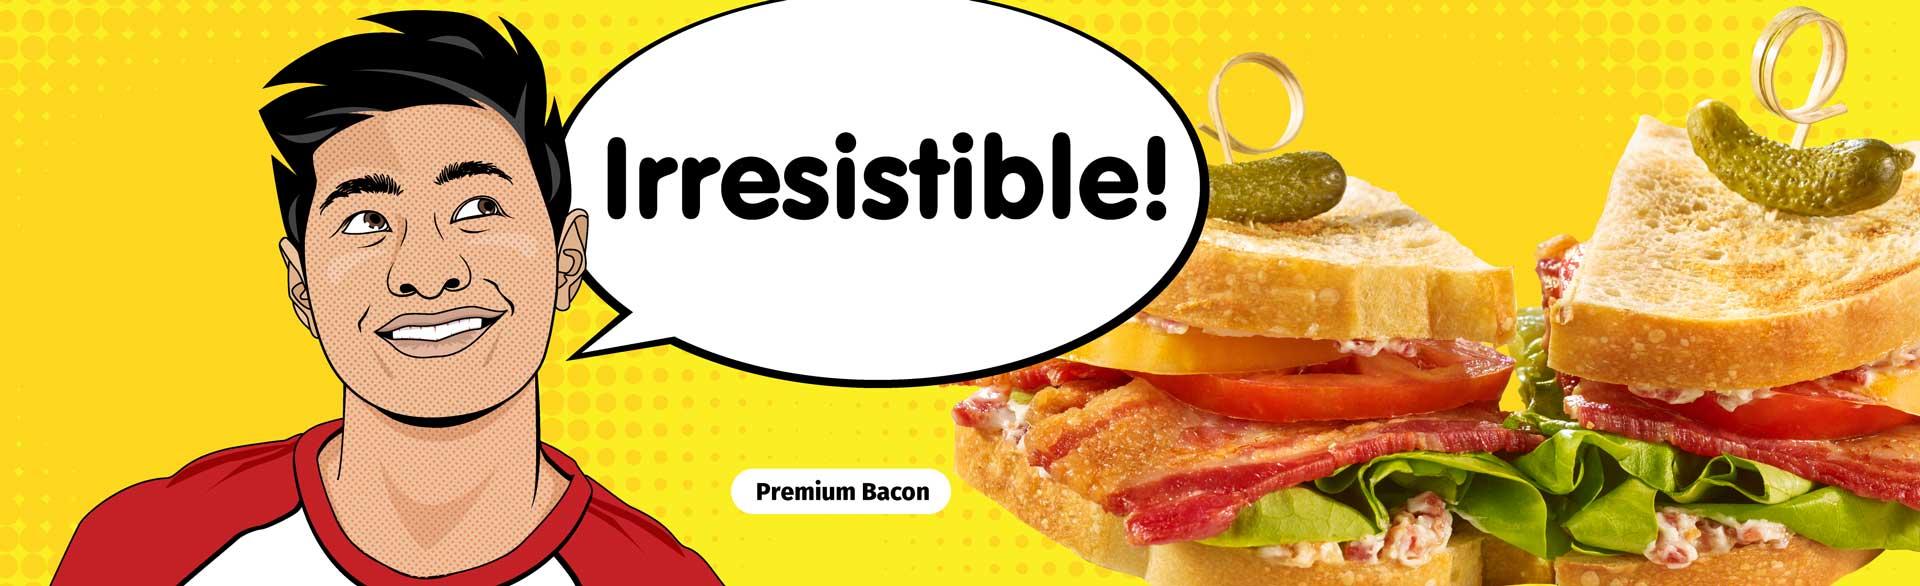 Irresistible! Premium Bacon